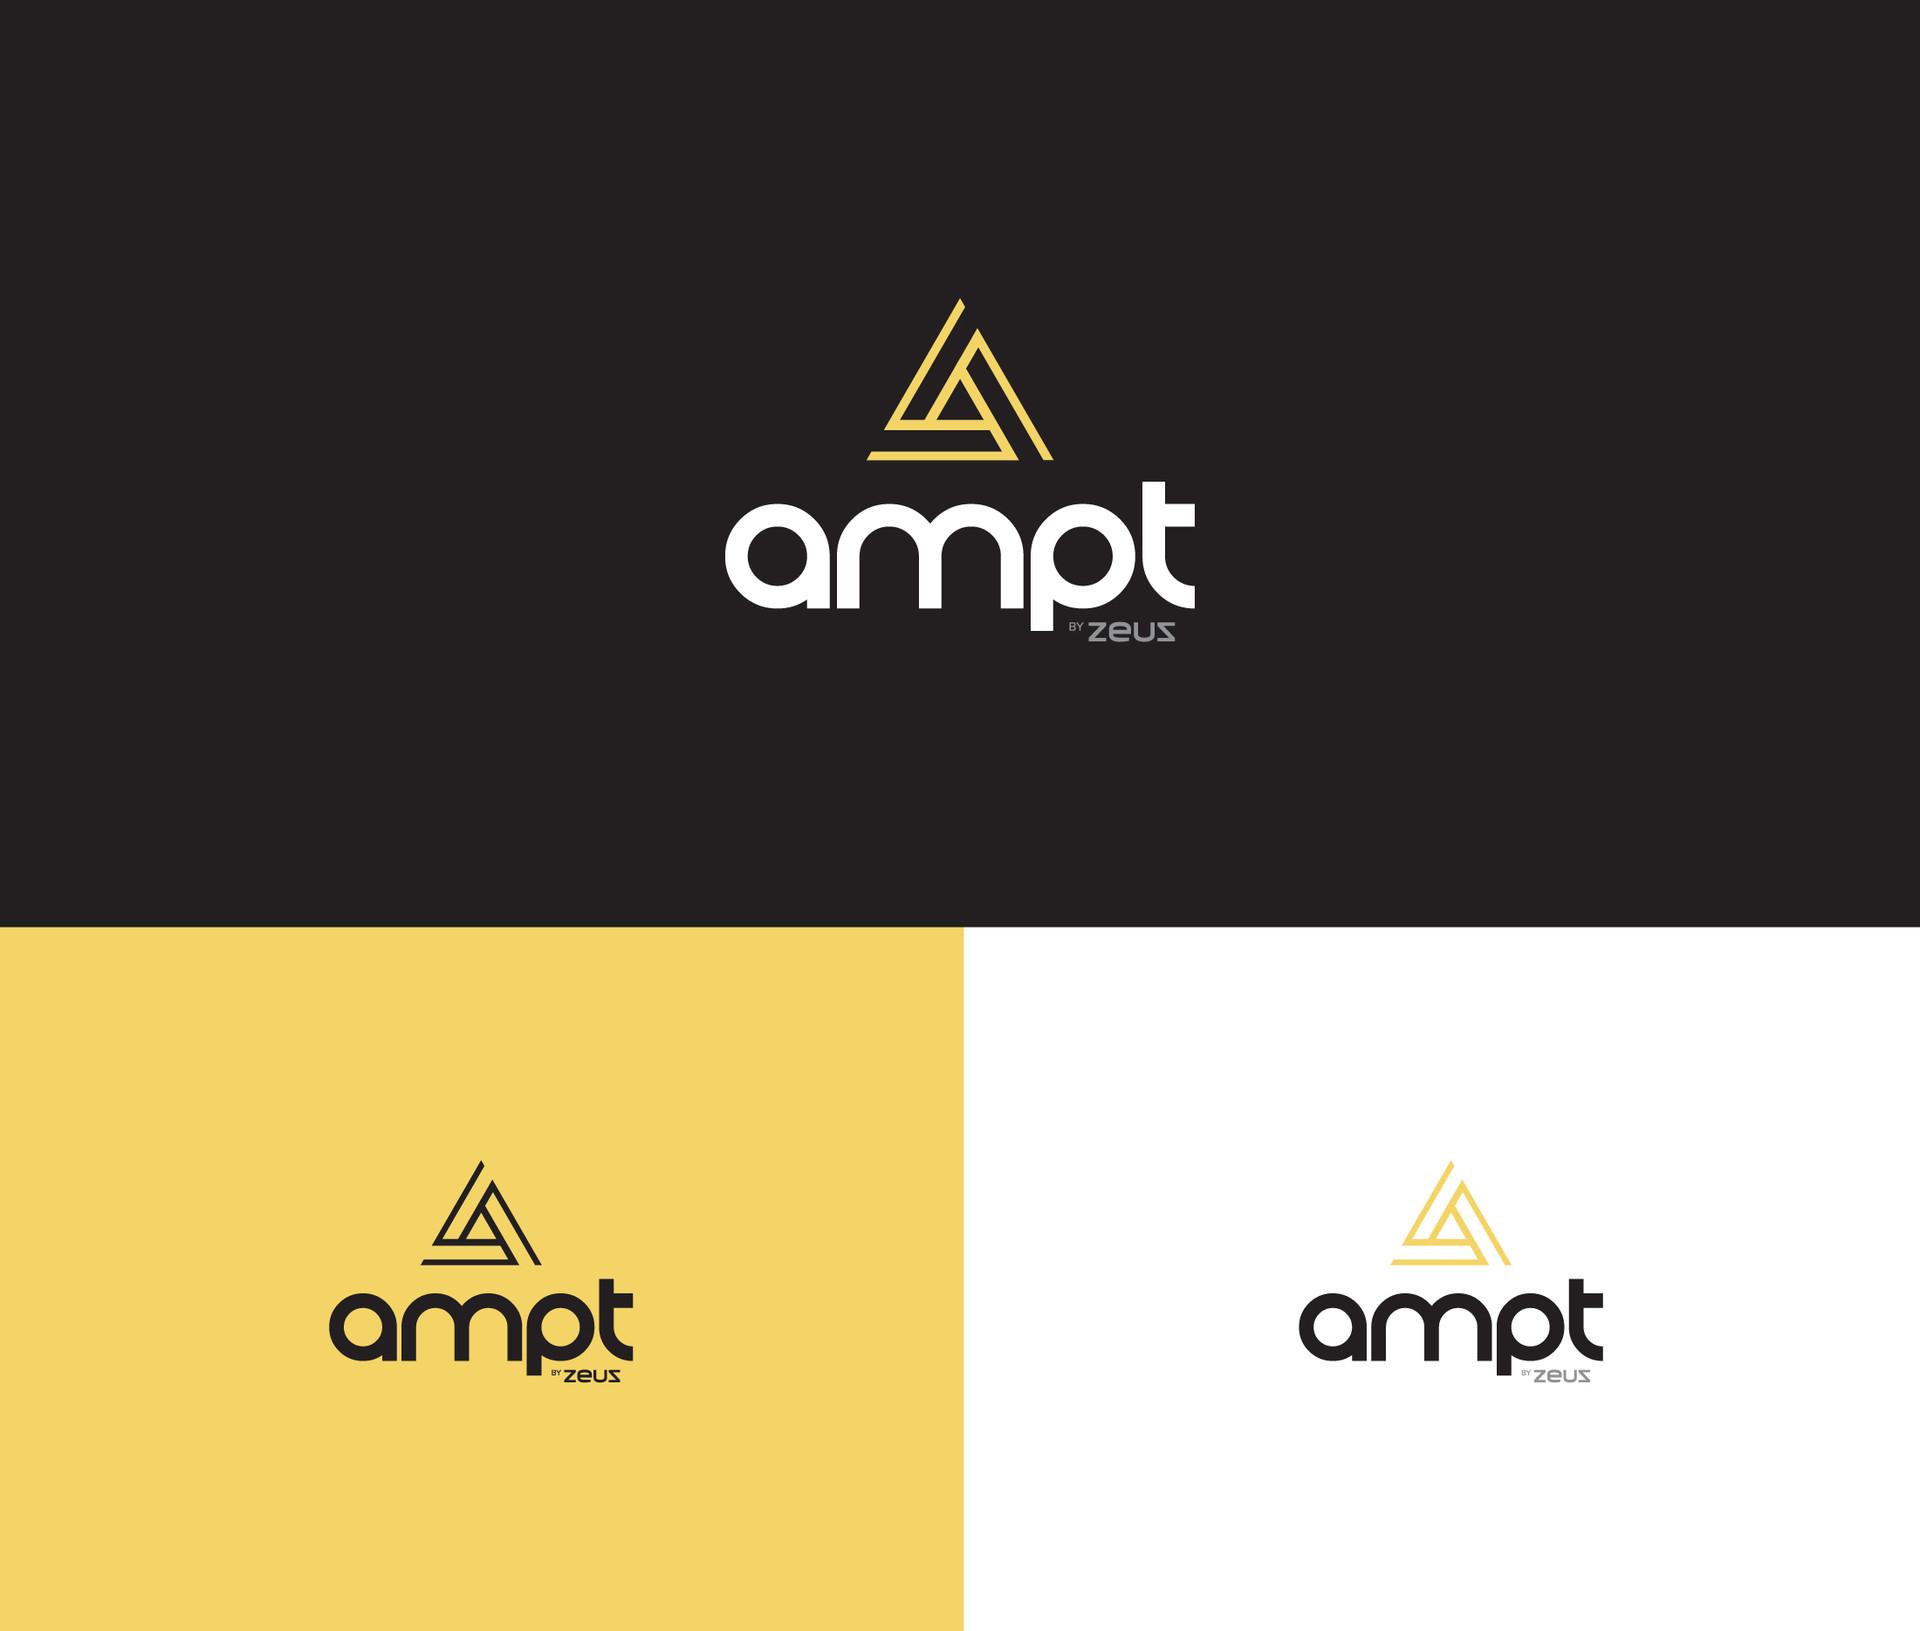 AMPT_PRODPAGE_01.jpg